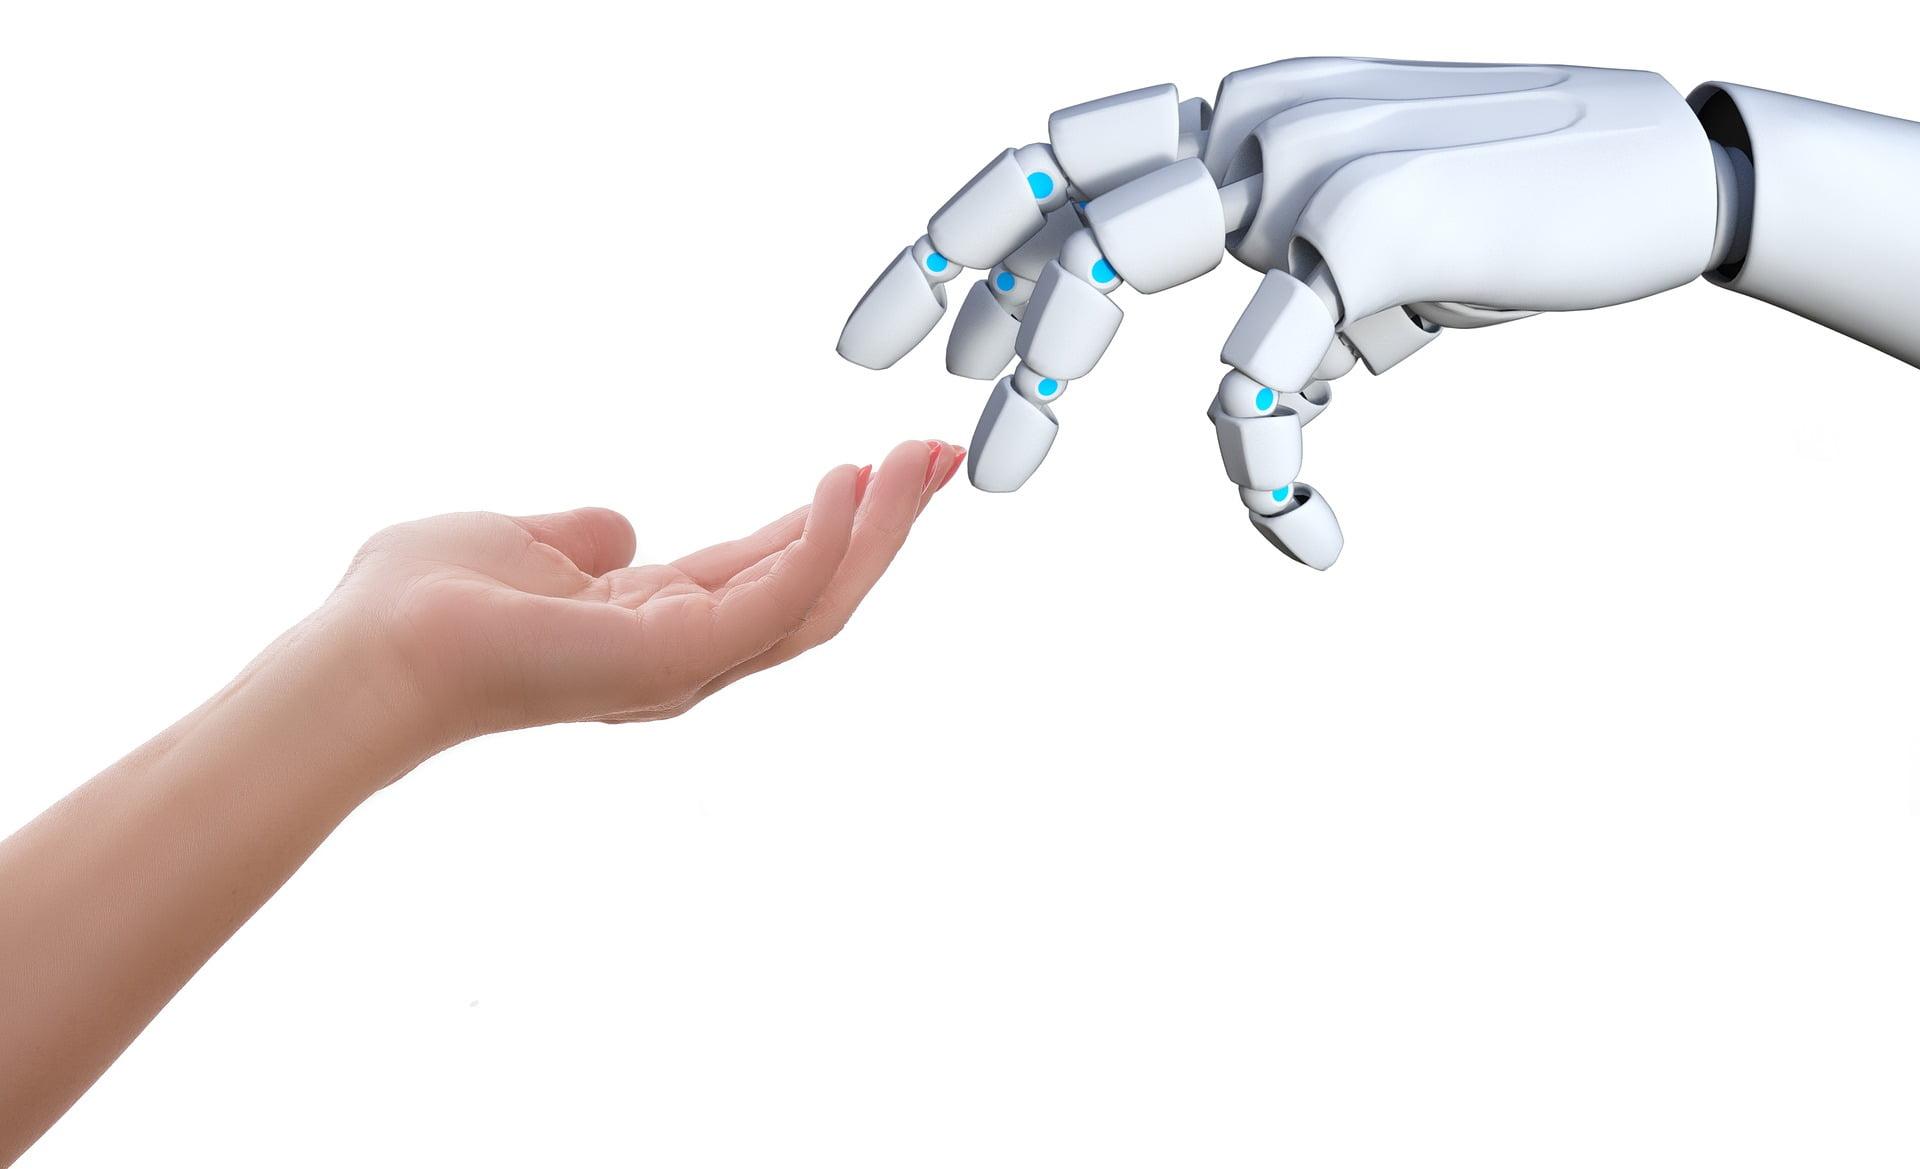 Hvor troverdige er investeringsroboter?